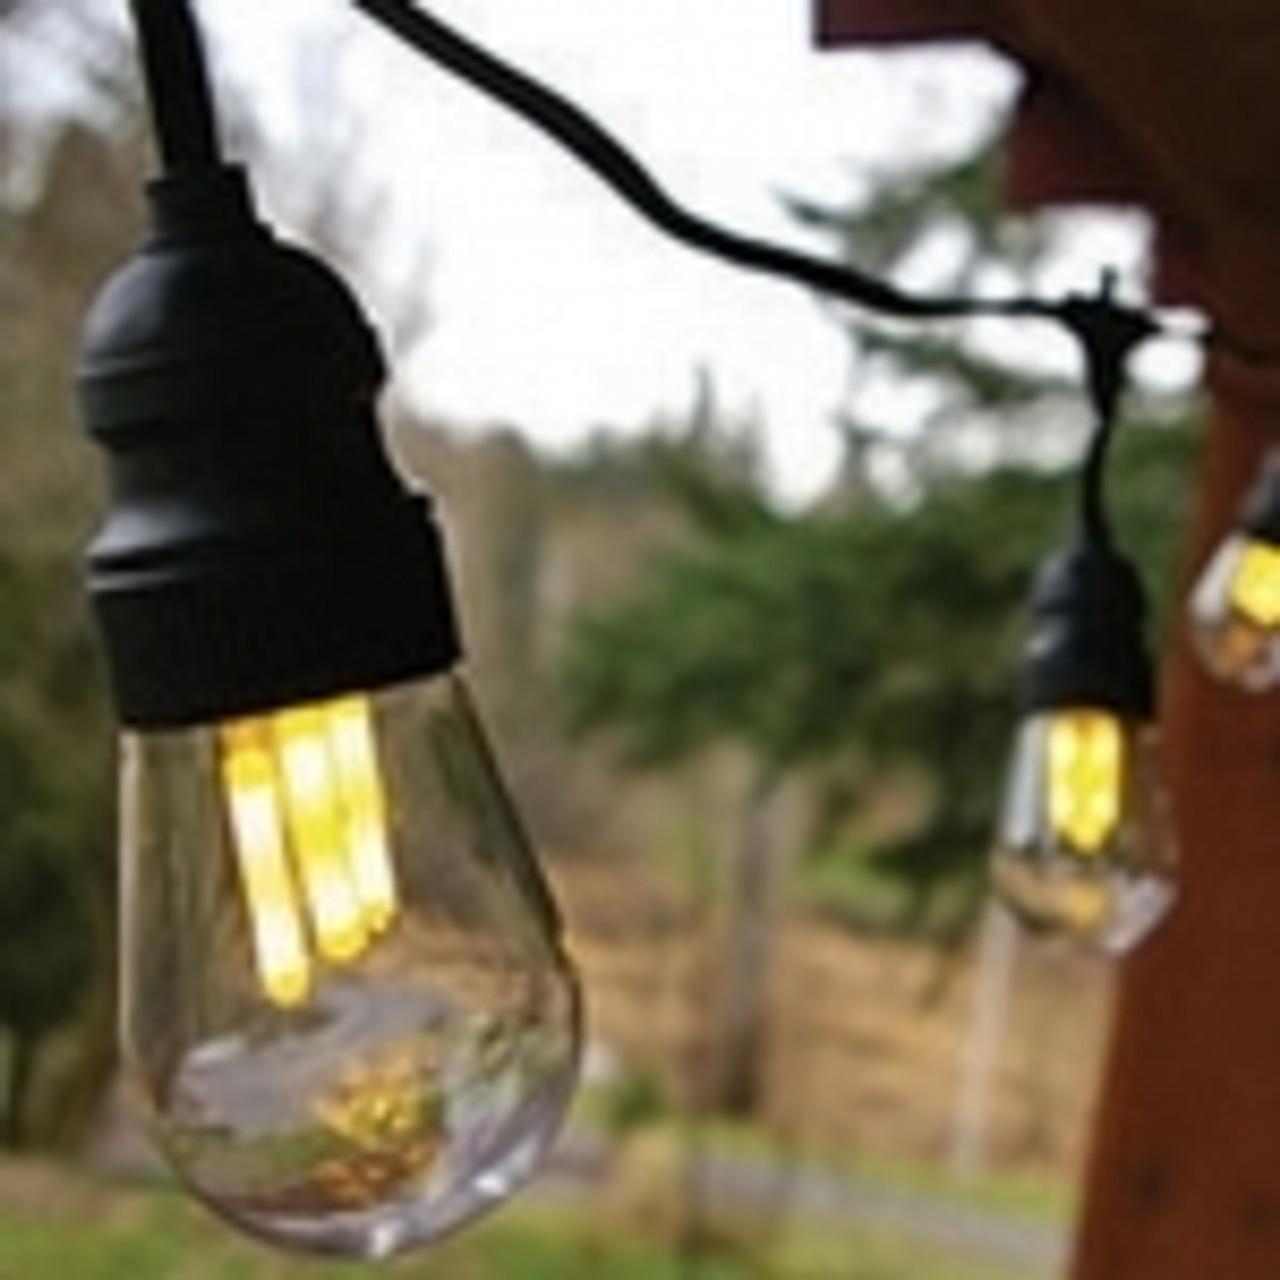 LED Vintage Style Light Strings